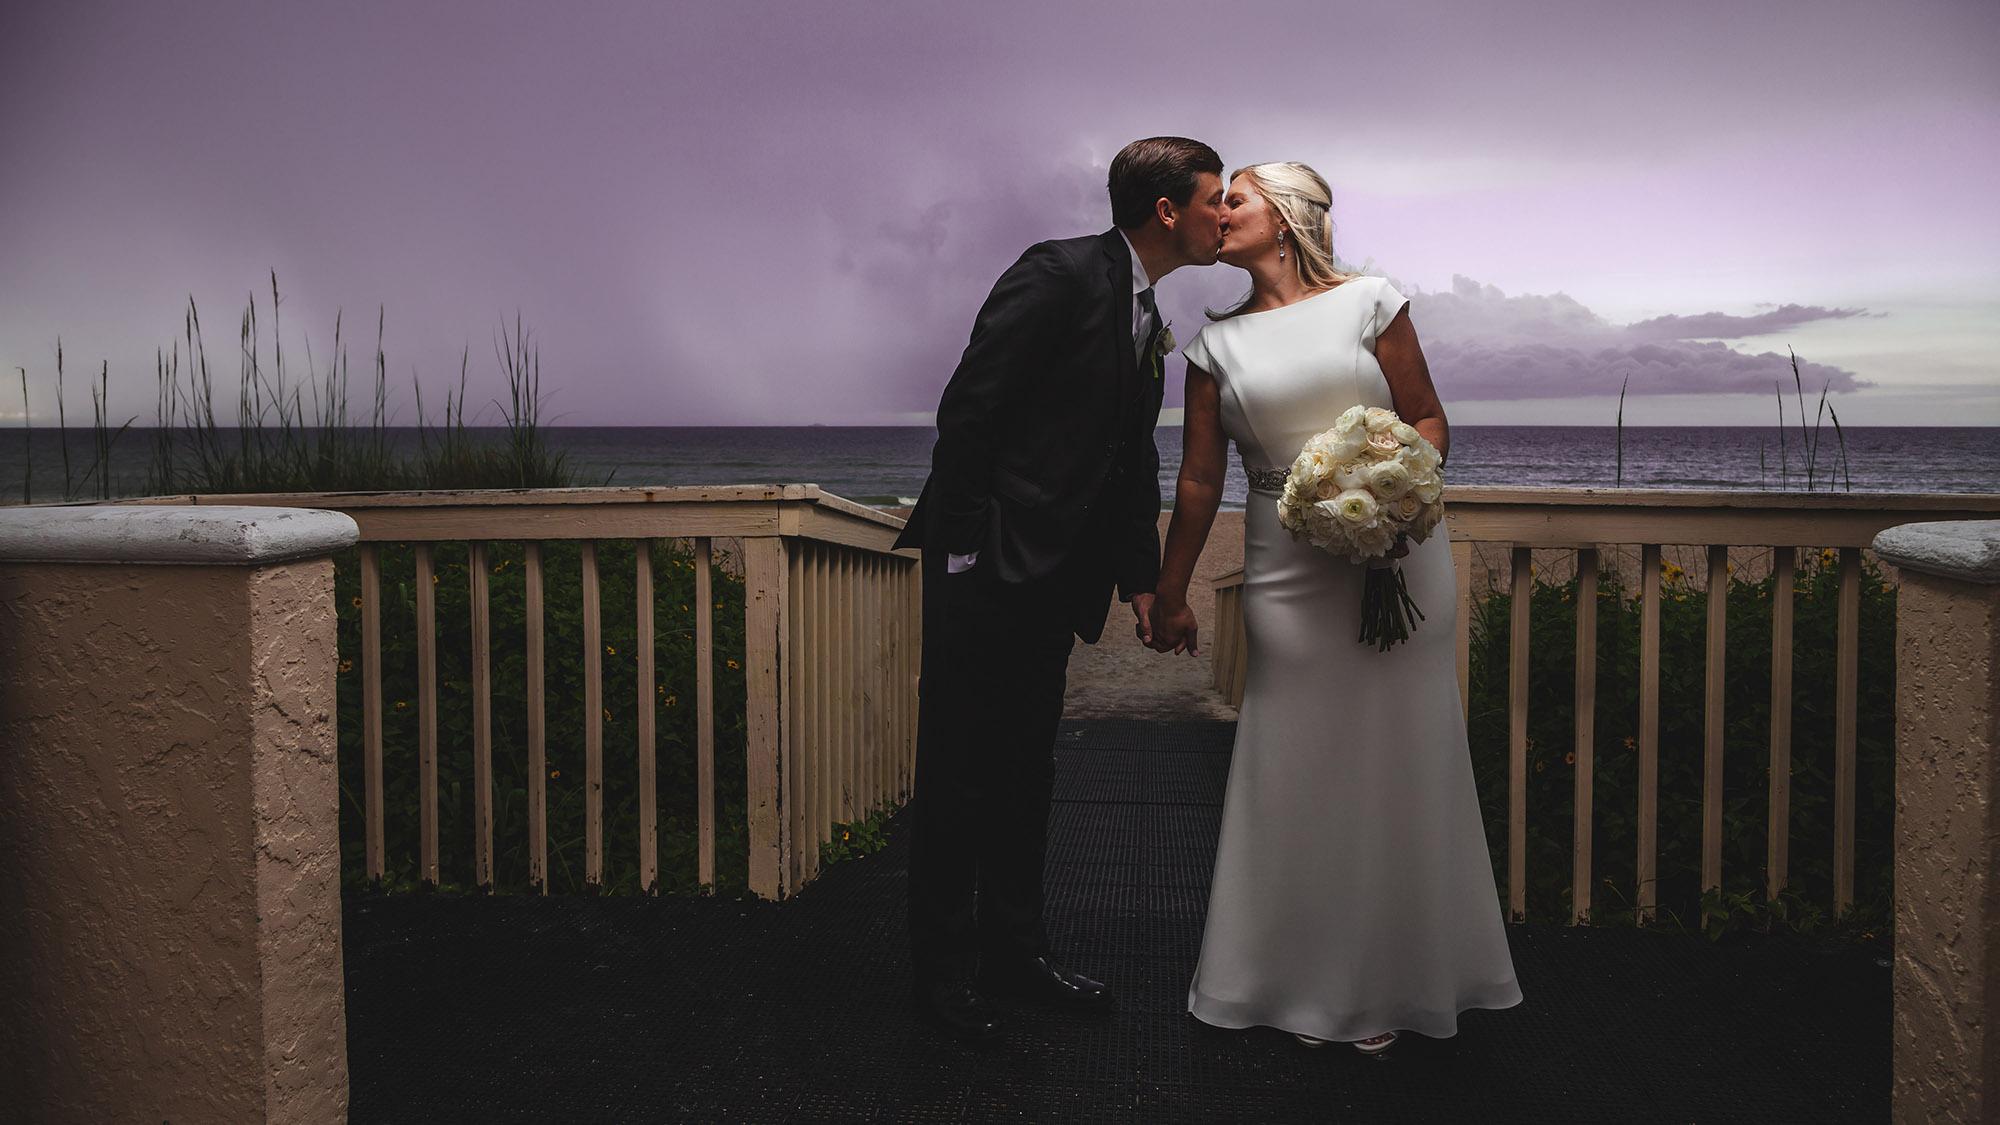 adam-szarmack-wedding-6.jpg